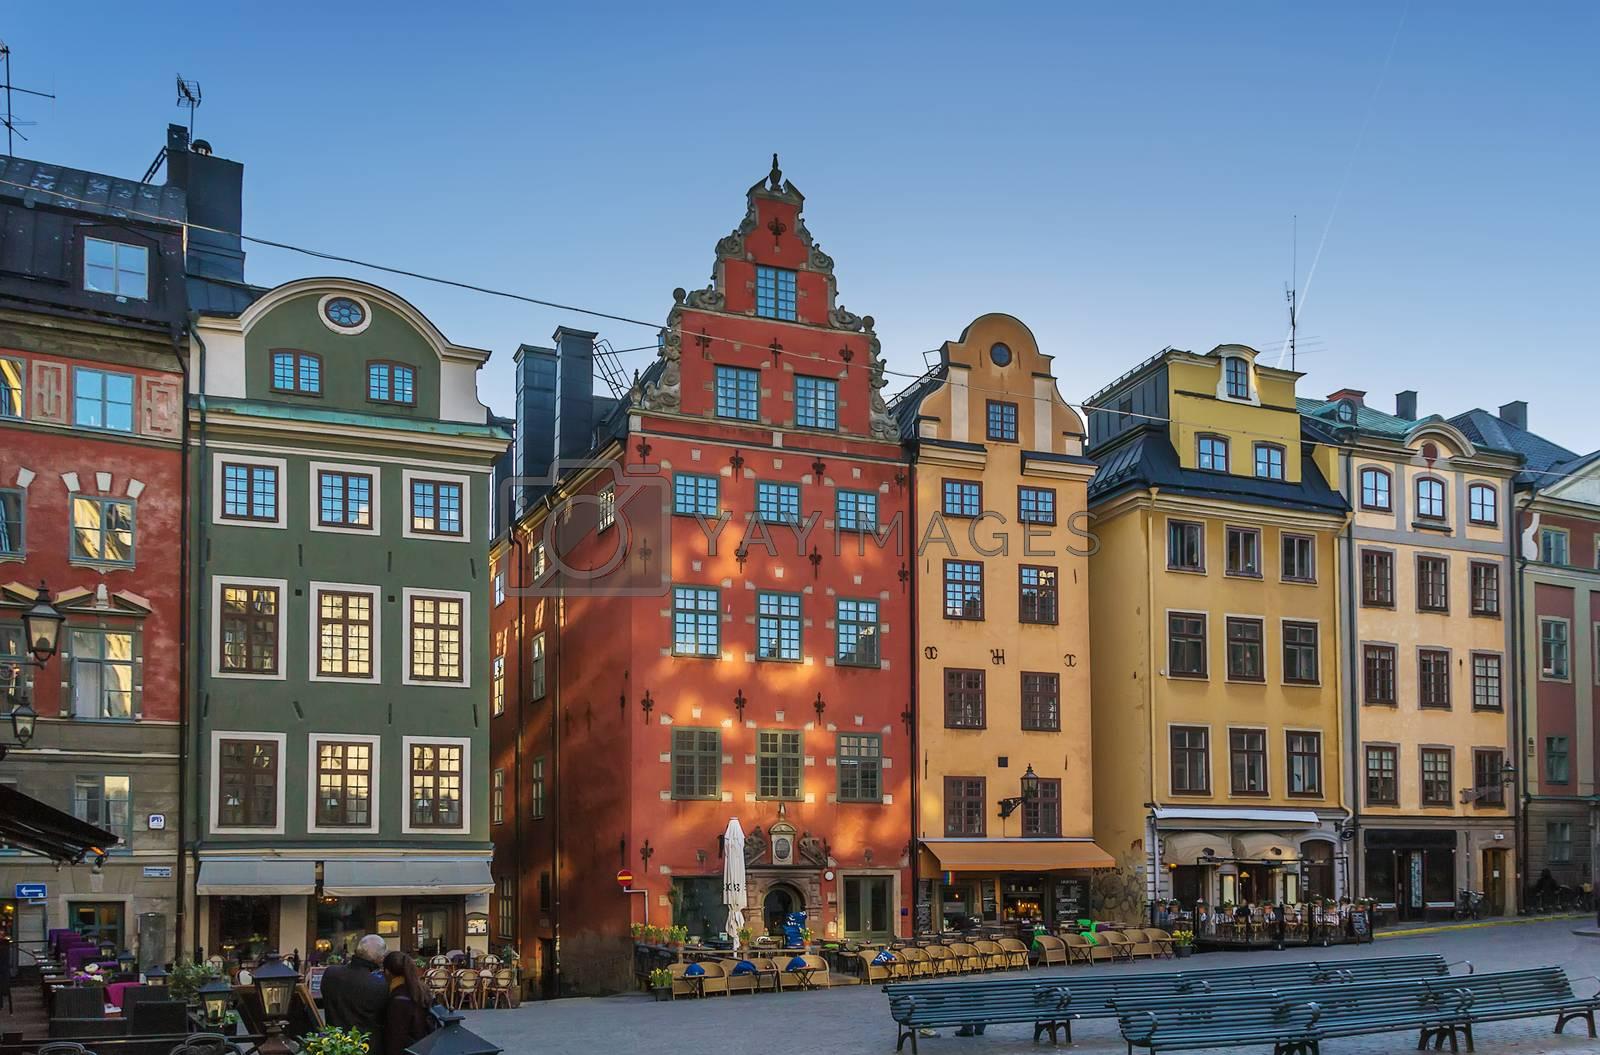 Stortorget, Stockholm by borisb17